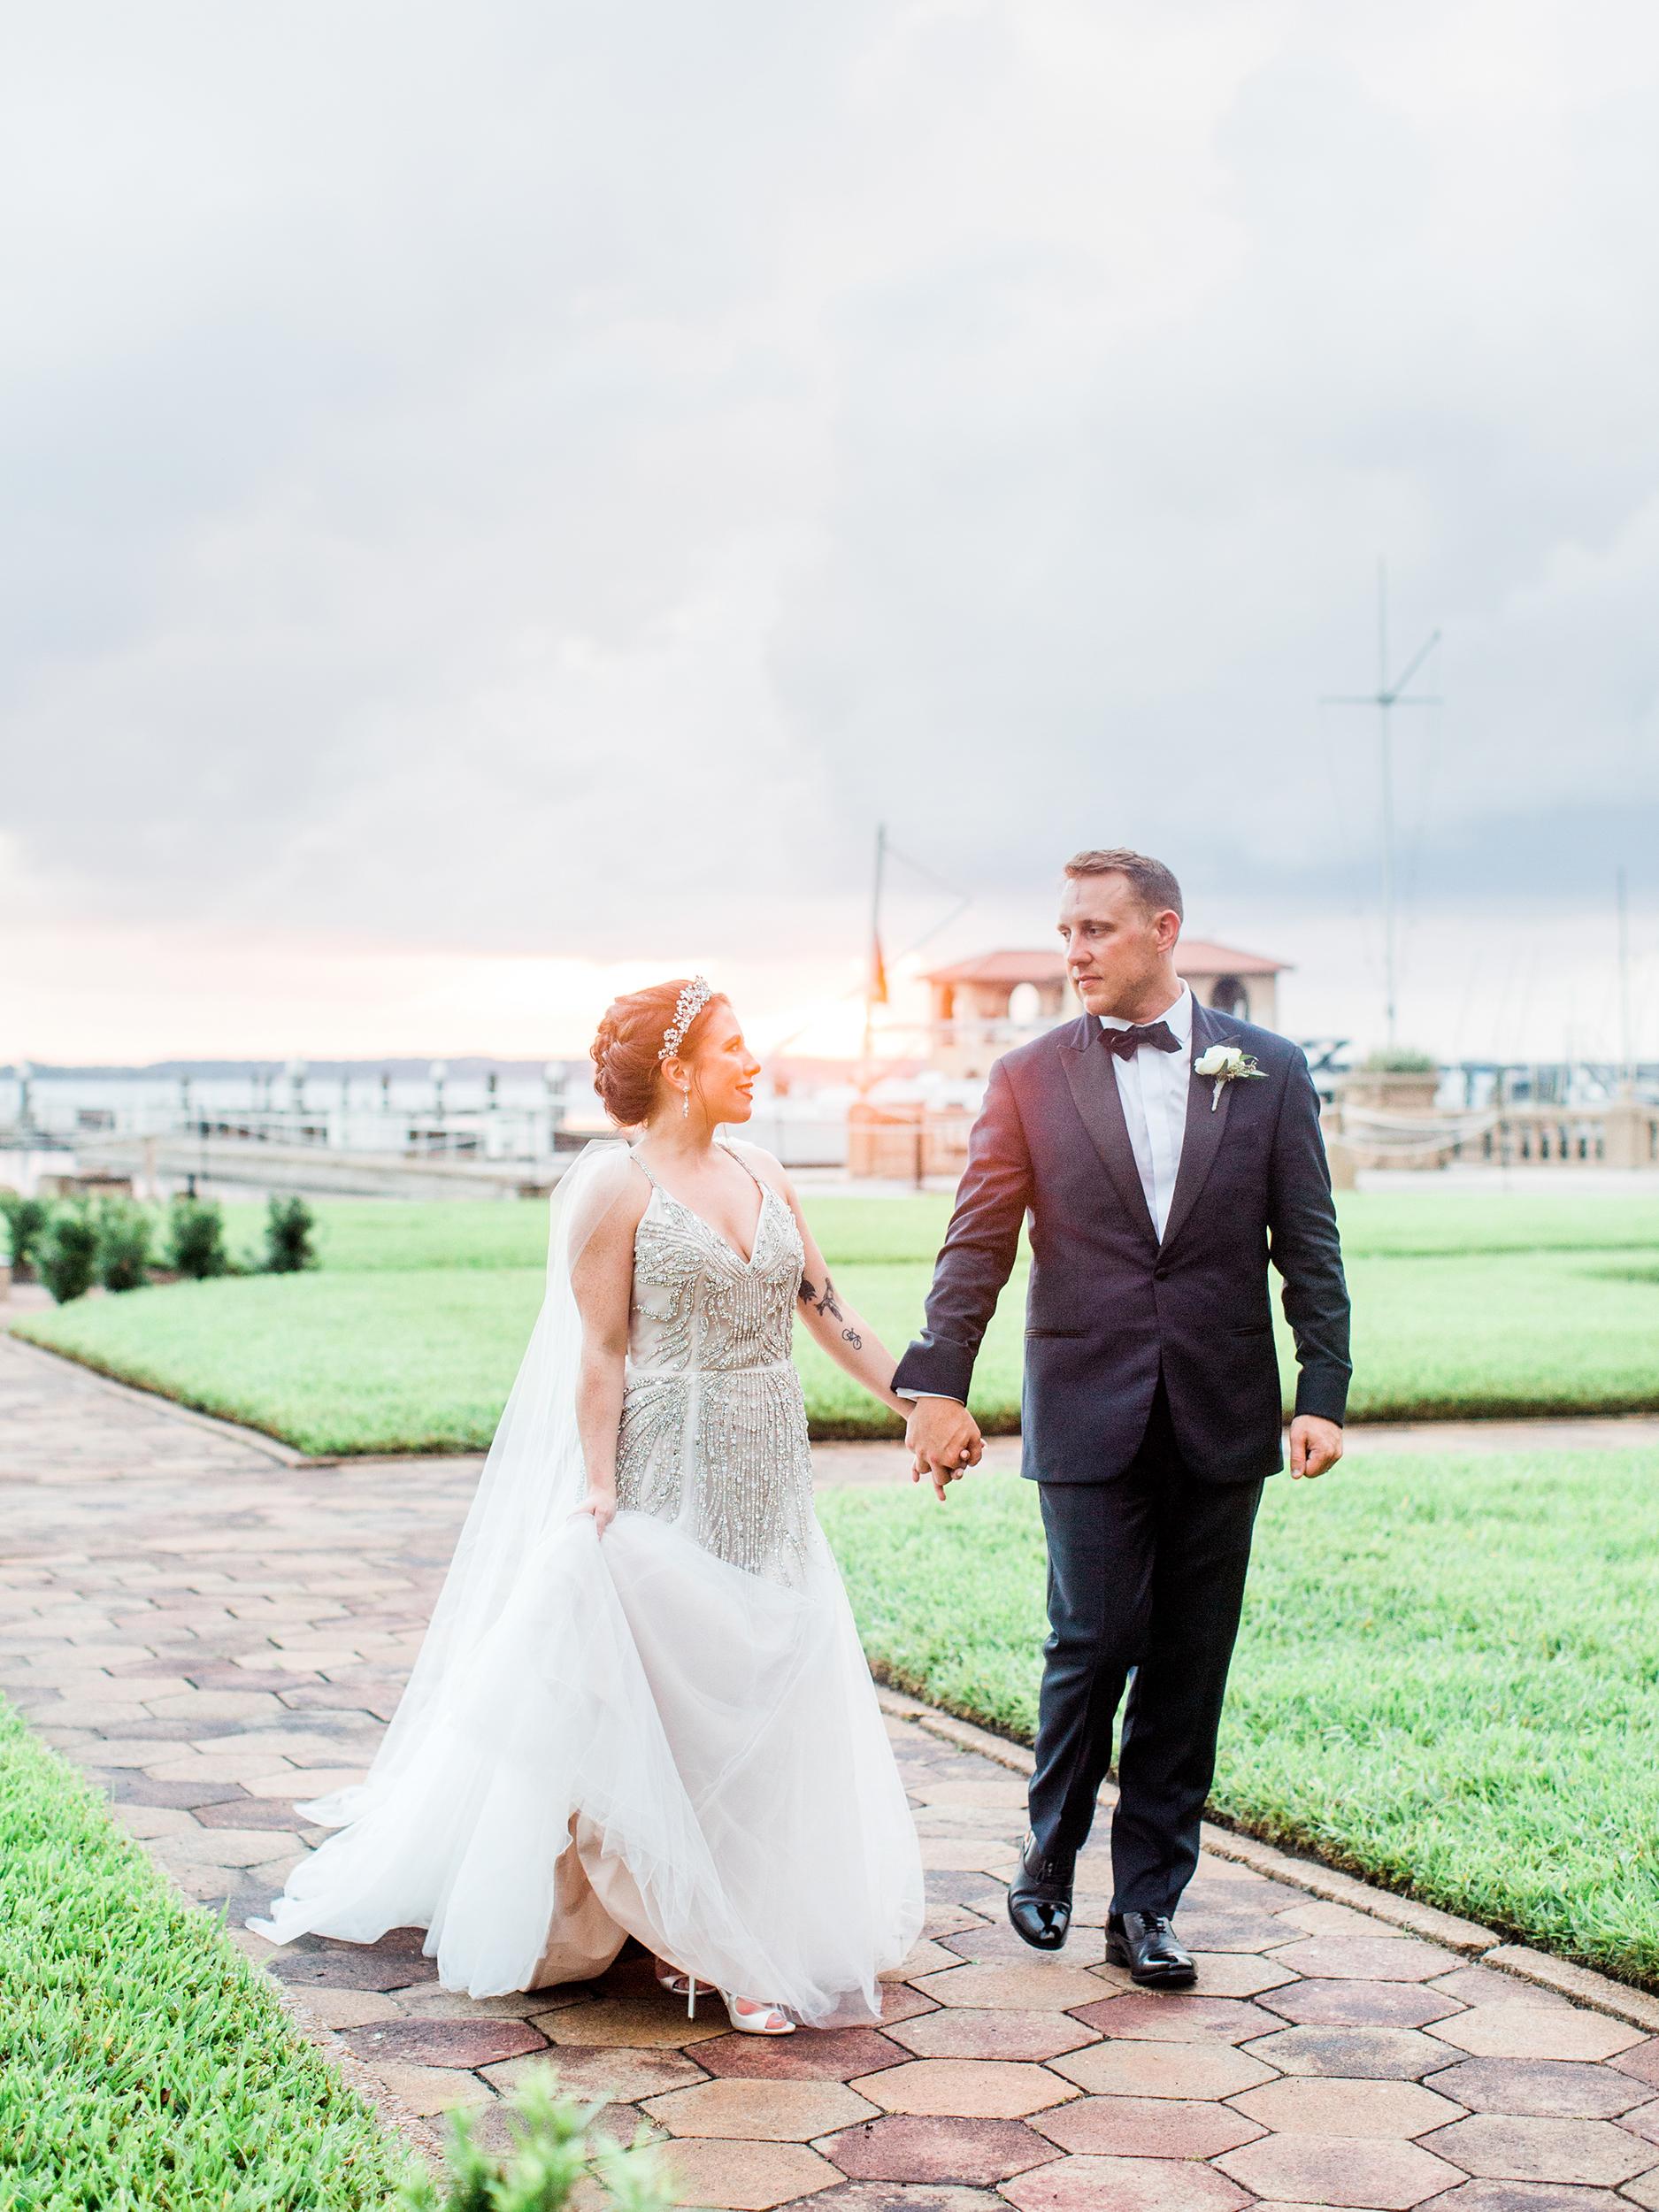 Lisa Silva Photography- Jacksonville, Florida Fine Art Film Wedding Photography Epping Forrest Yacht Club 49.jpg